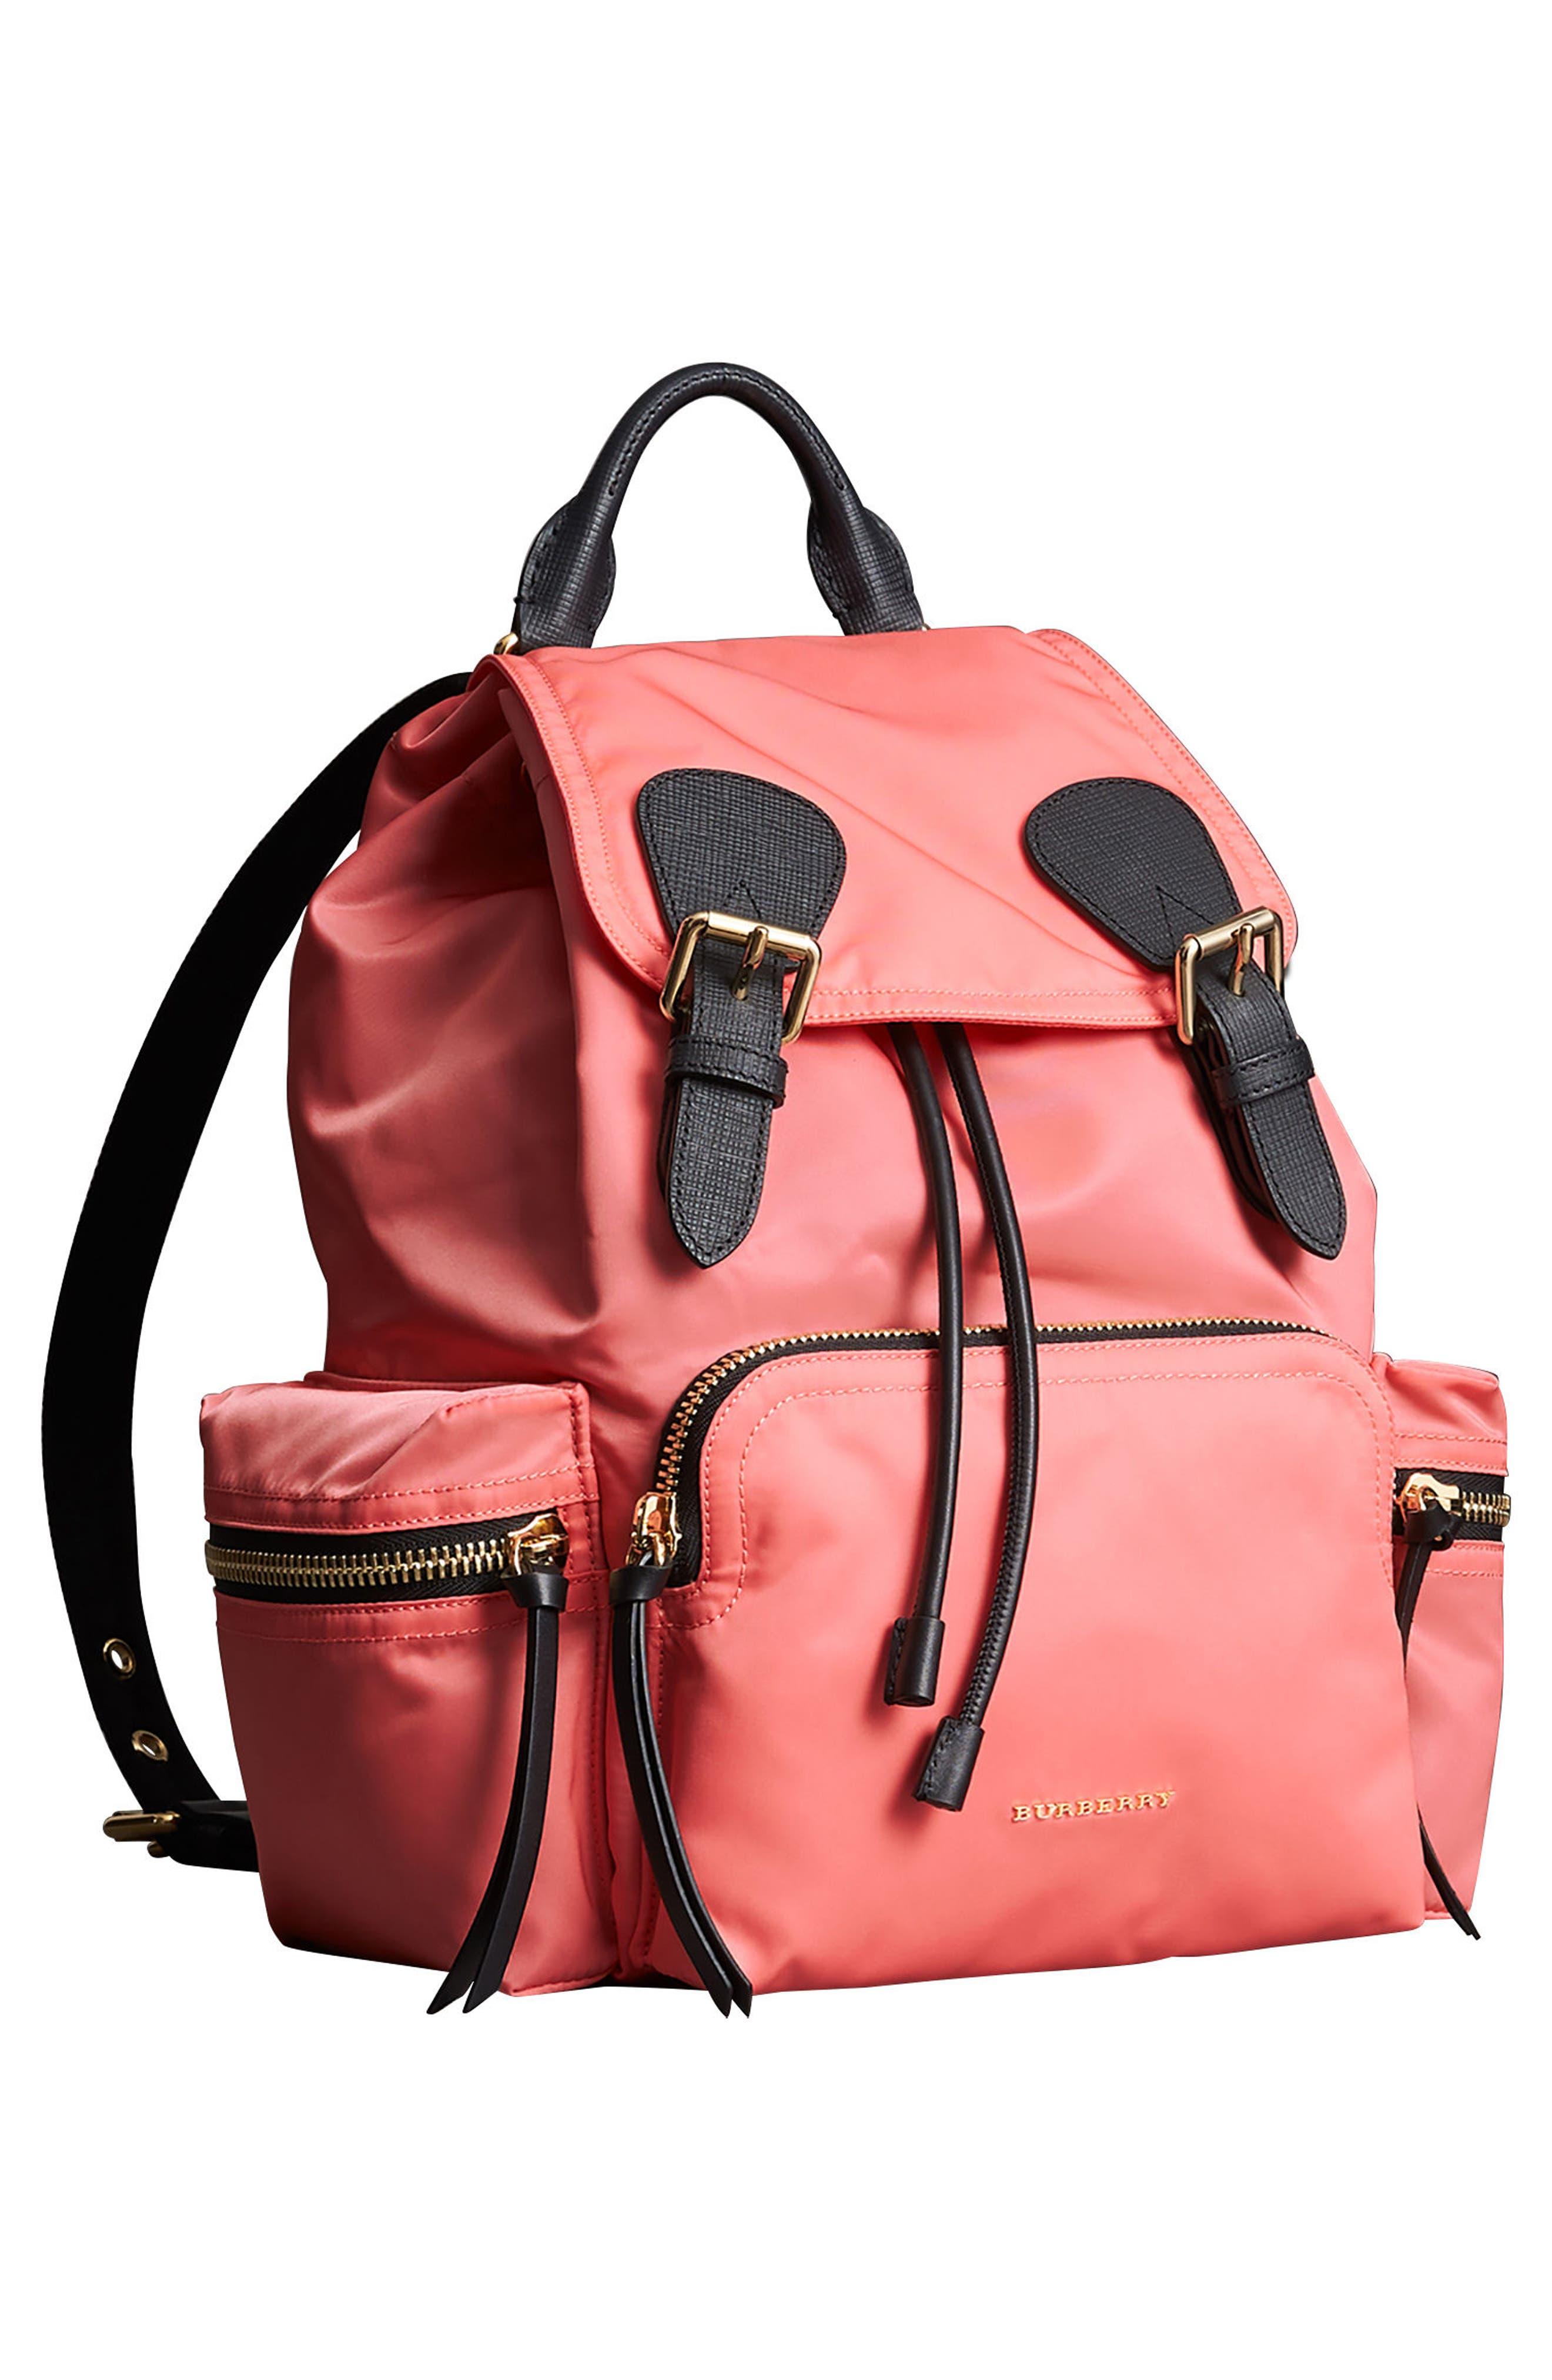 Medium Rucksack Nylon Backpack,                             Alternate thumbnail 3, color,                             Bright Coral Pink